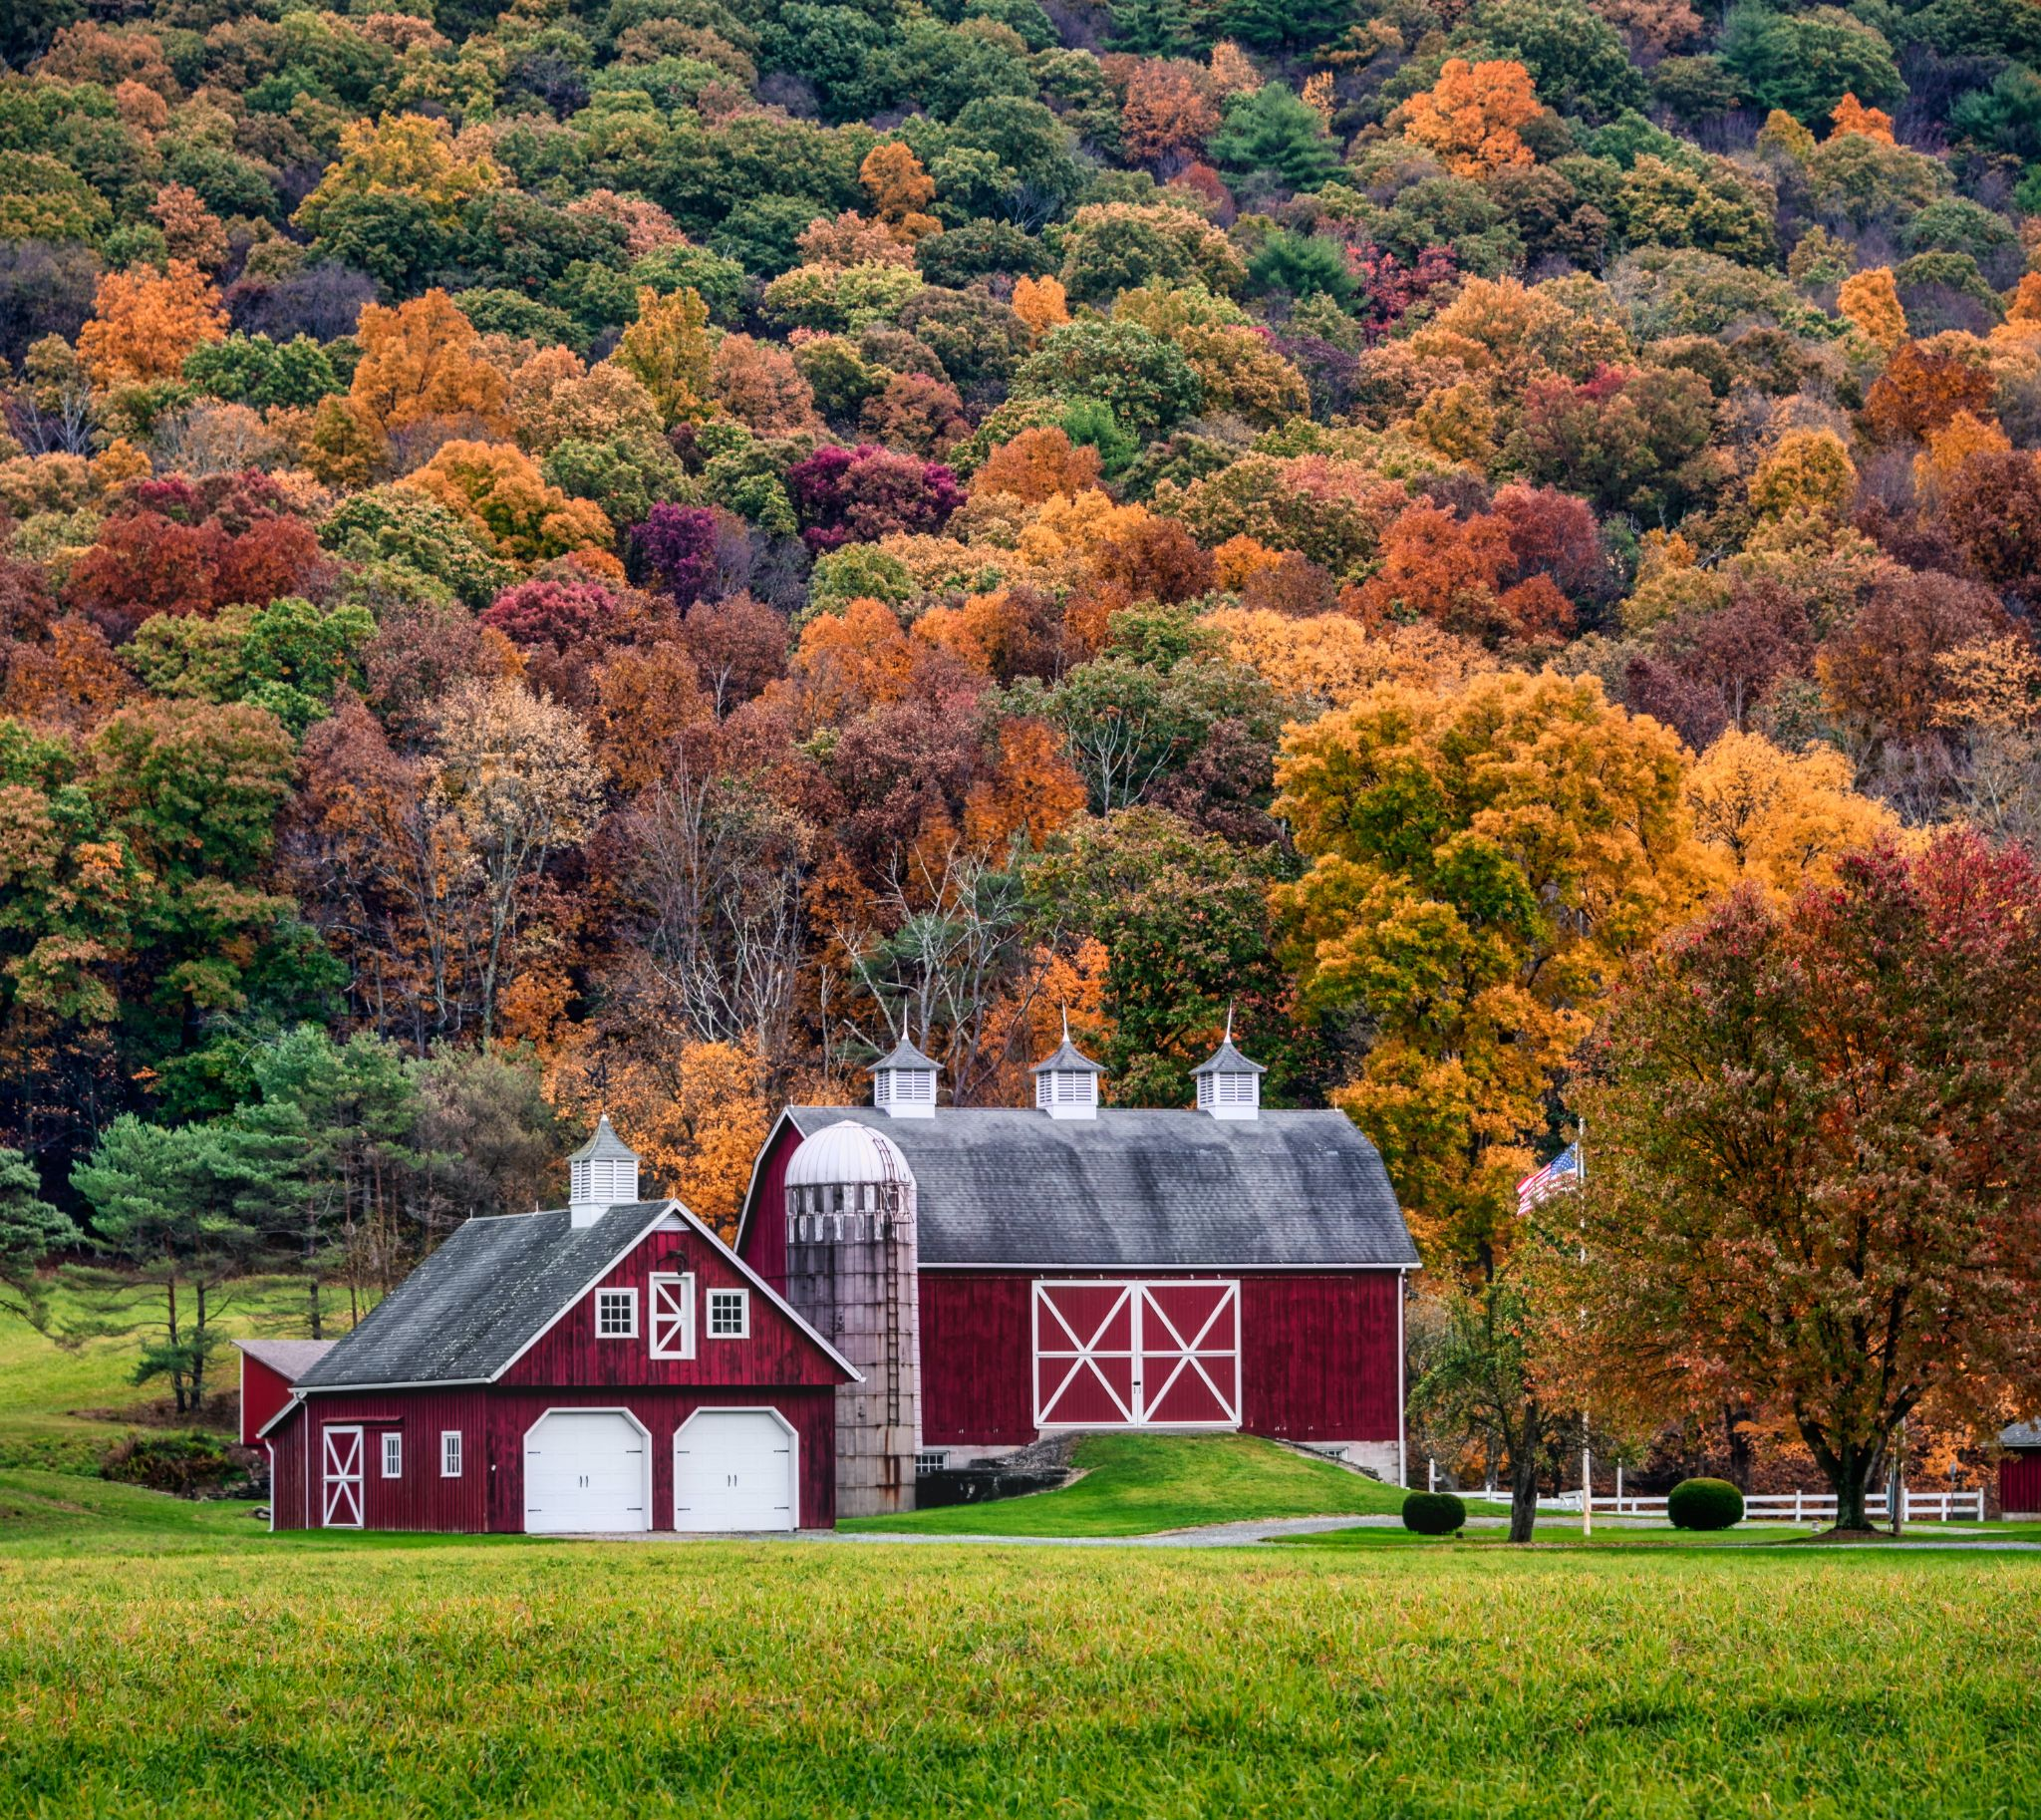 6 Ways to Make Money Off of Farmland